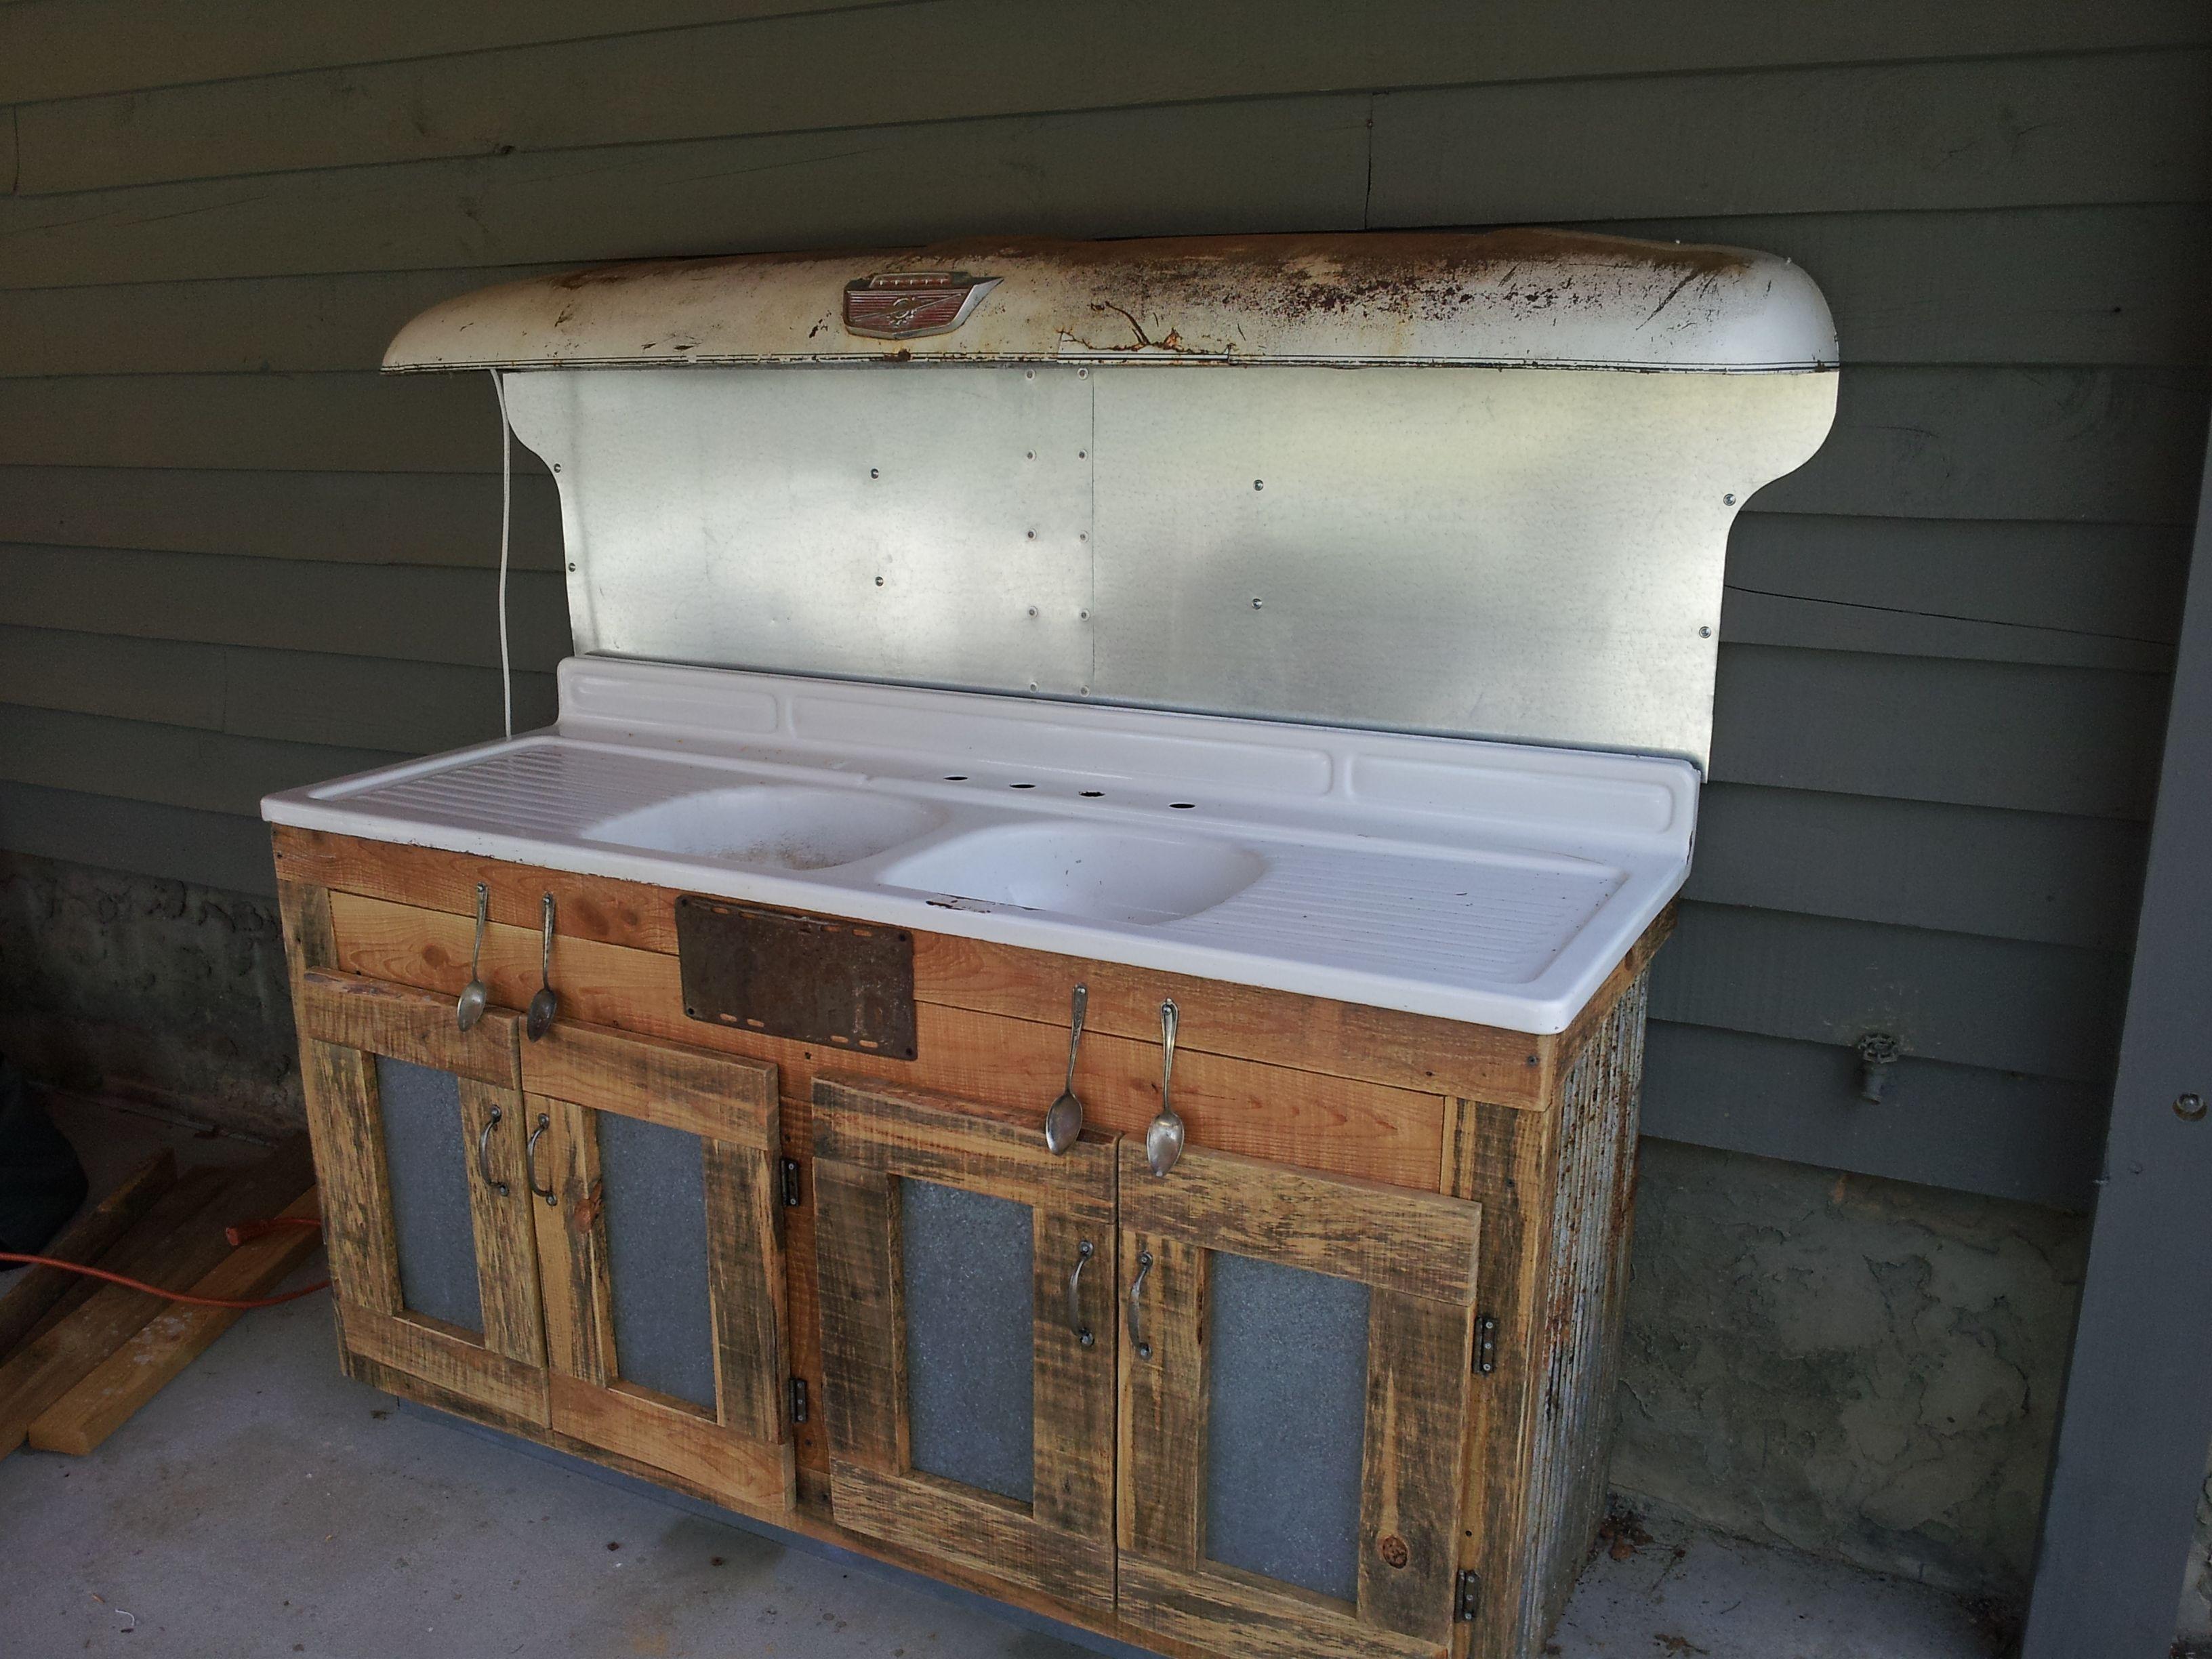 an enameled steel double sideboard sink rough cut sawmill. Black Bedroom Furniture Sets. Home Design Ideas